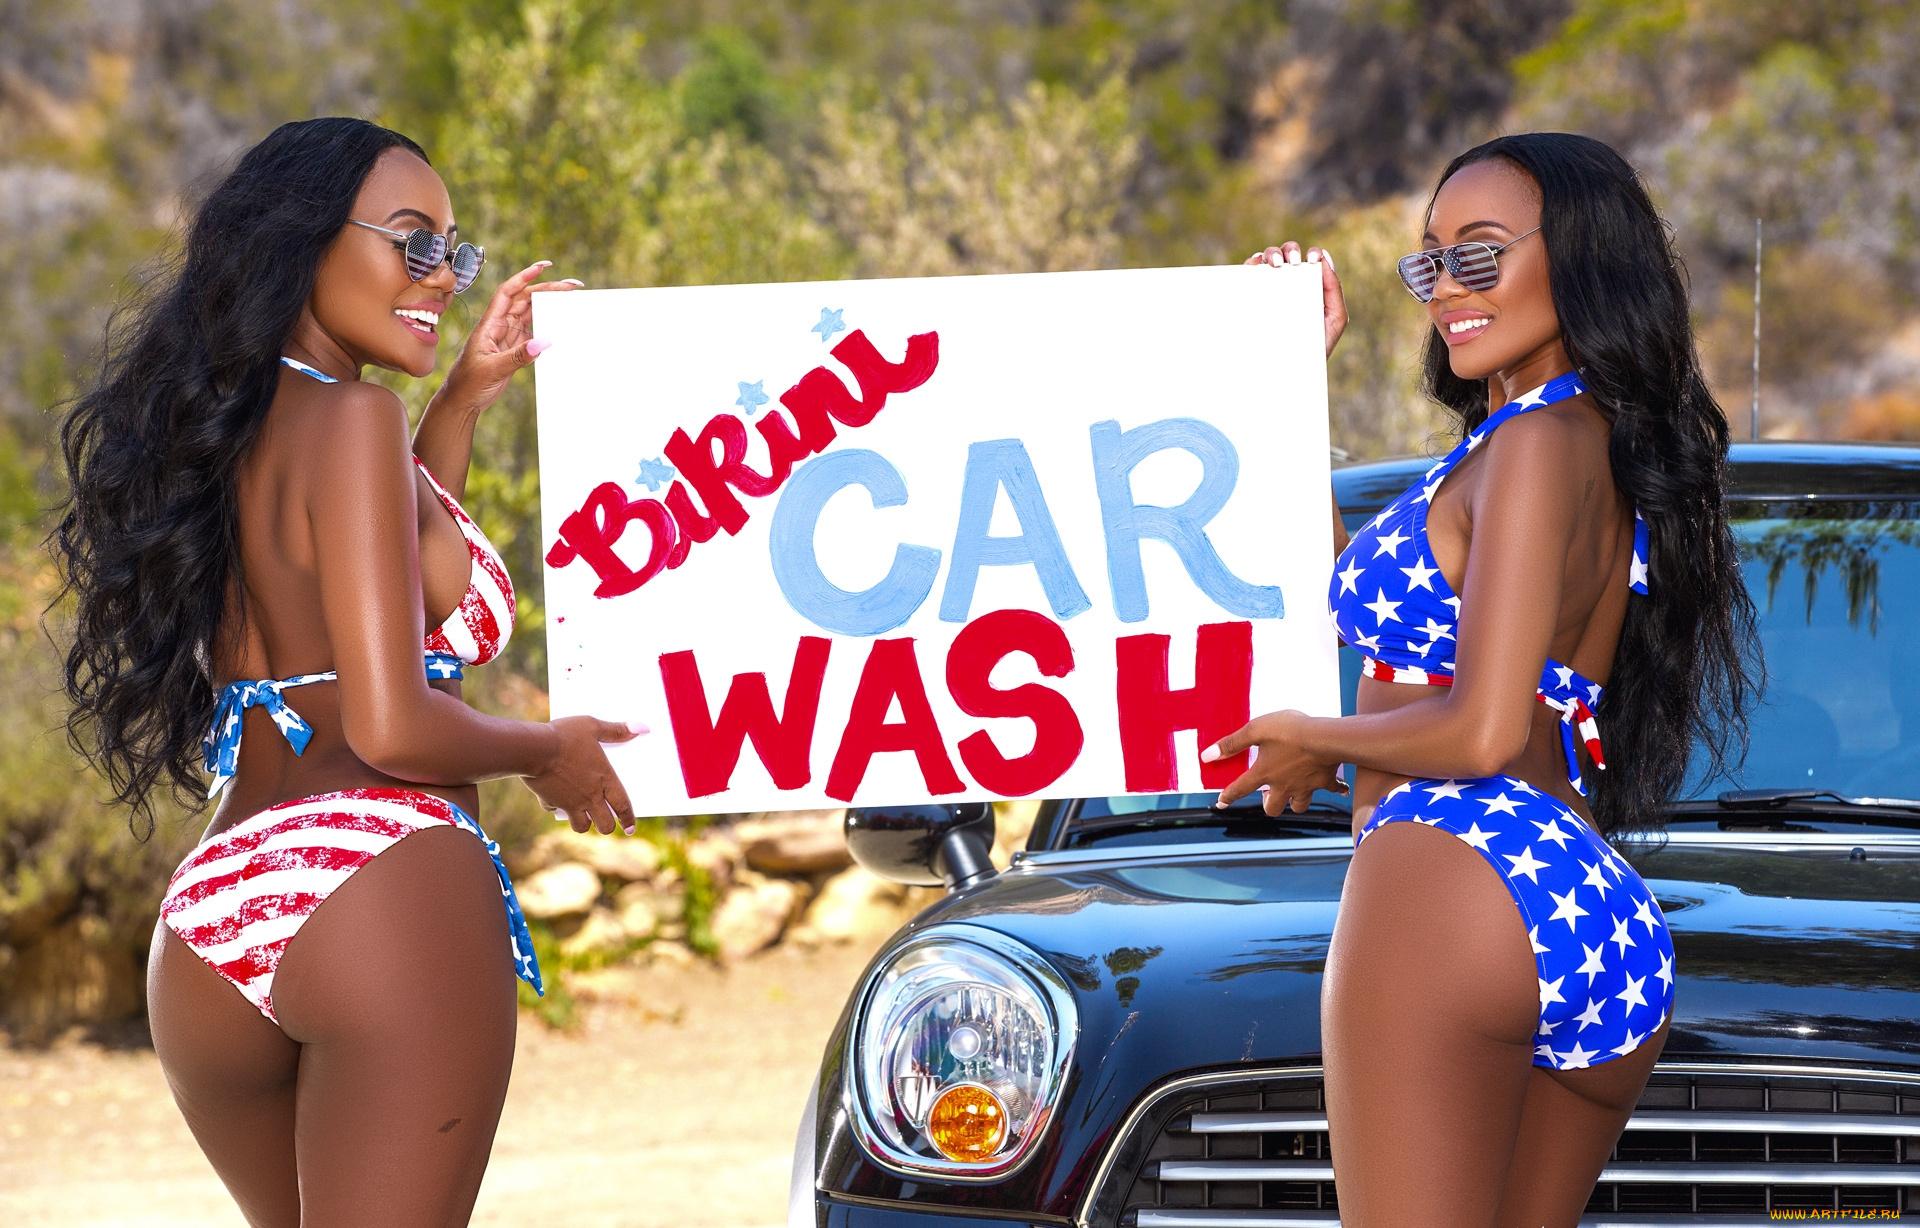 Ebony centerfold models Brittany and Brandi Kelly wash car naked  723484